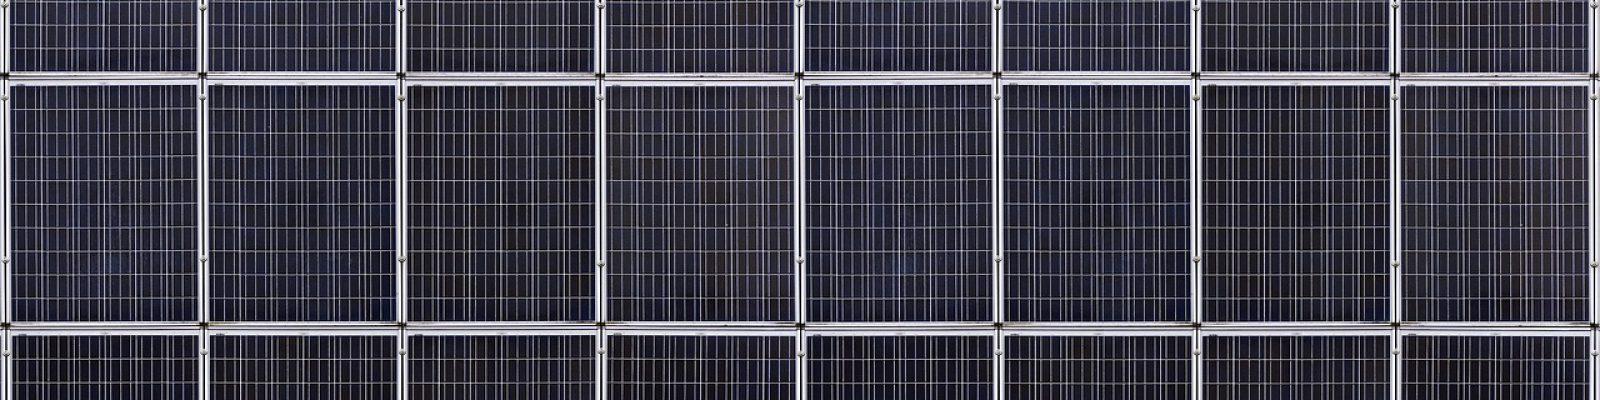 solar-cells-2810730_1280